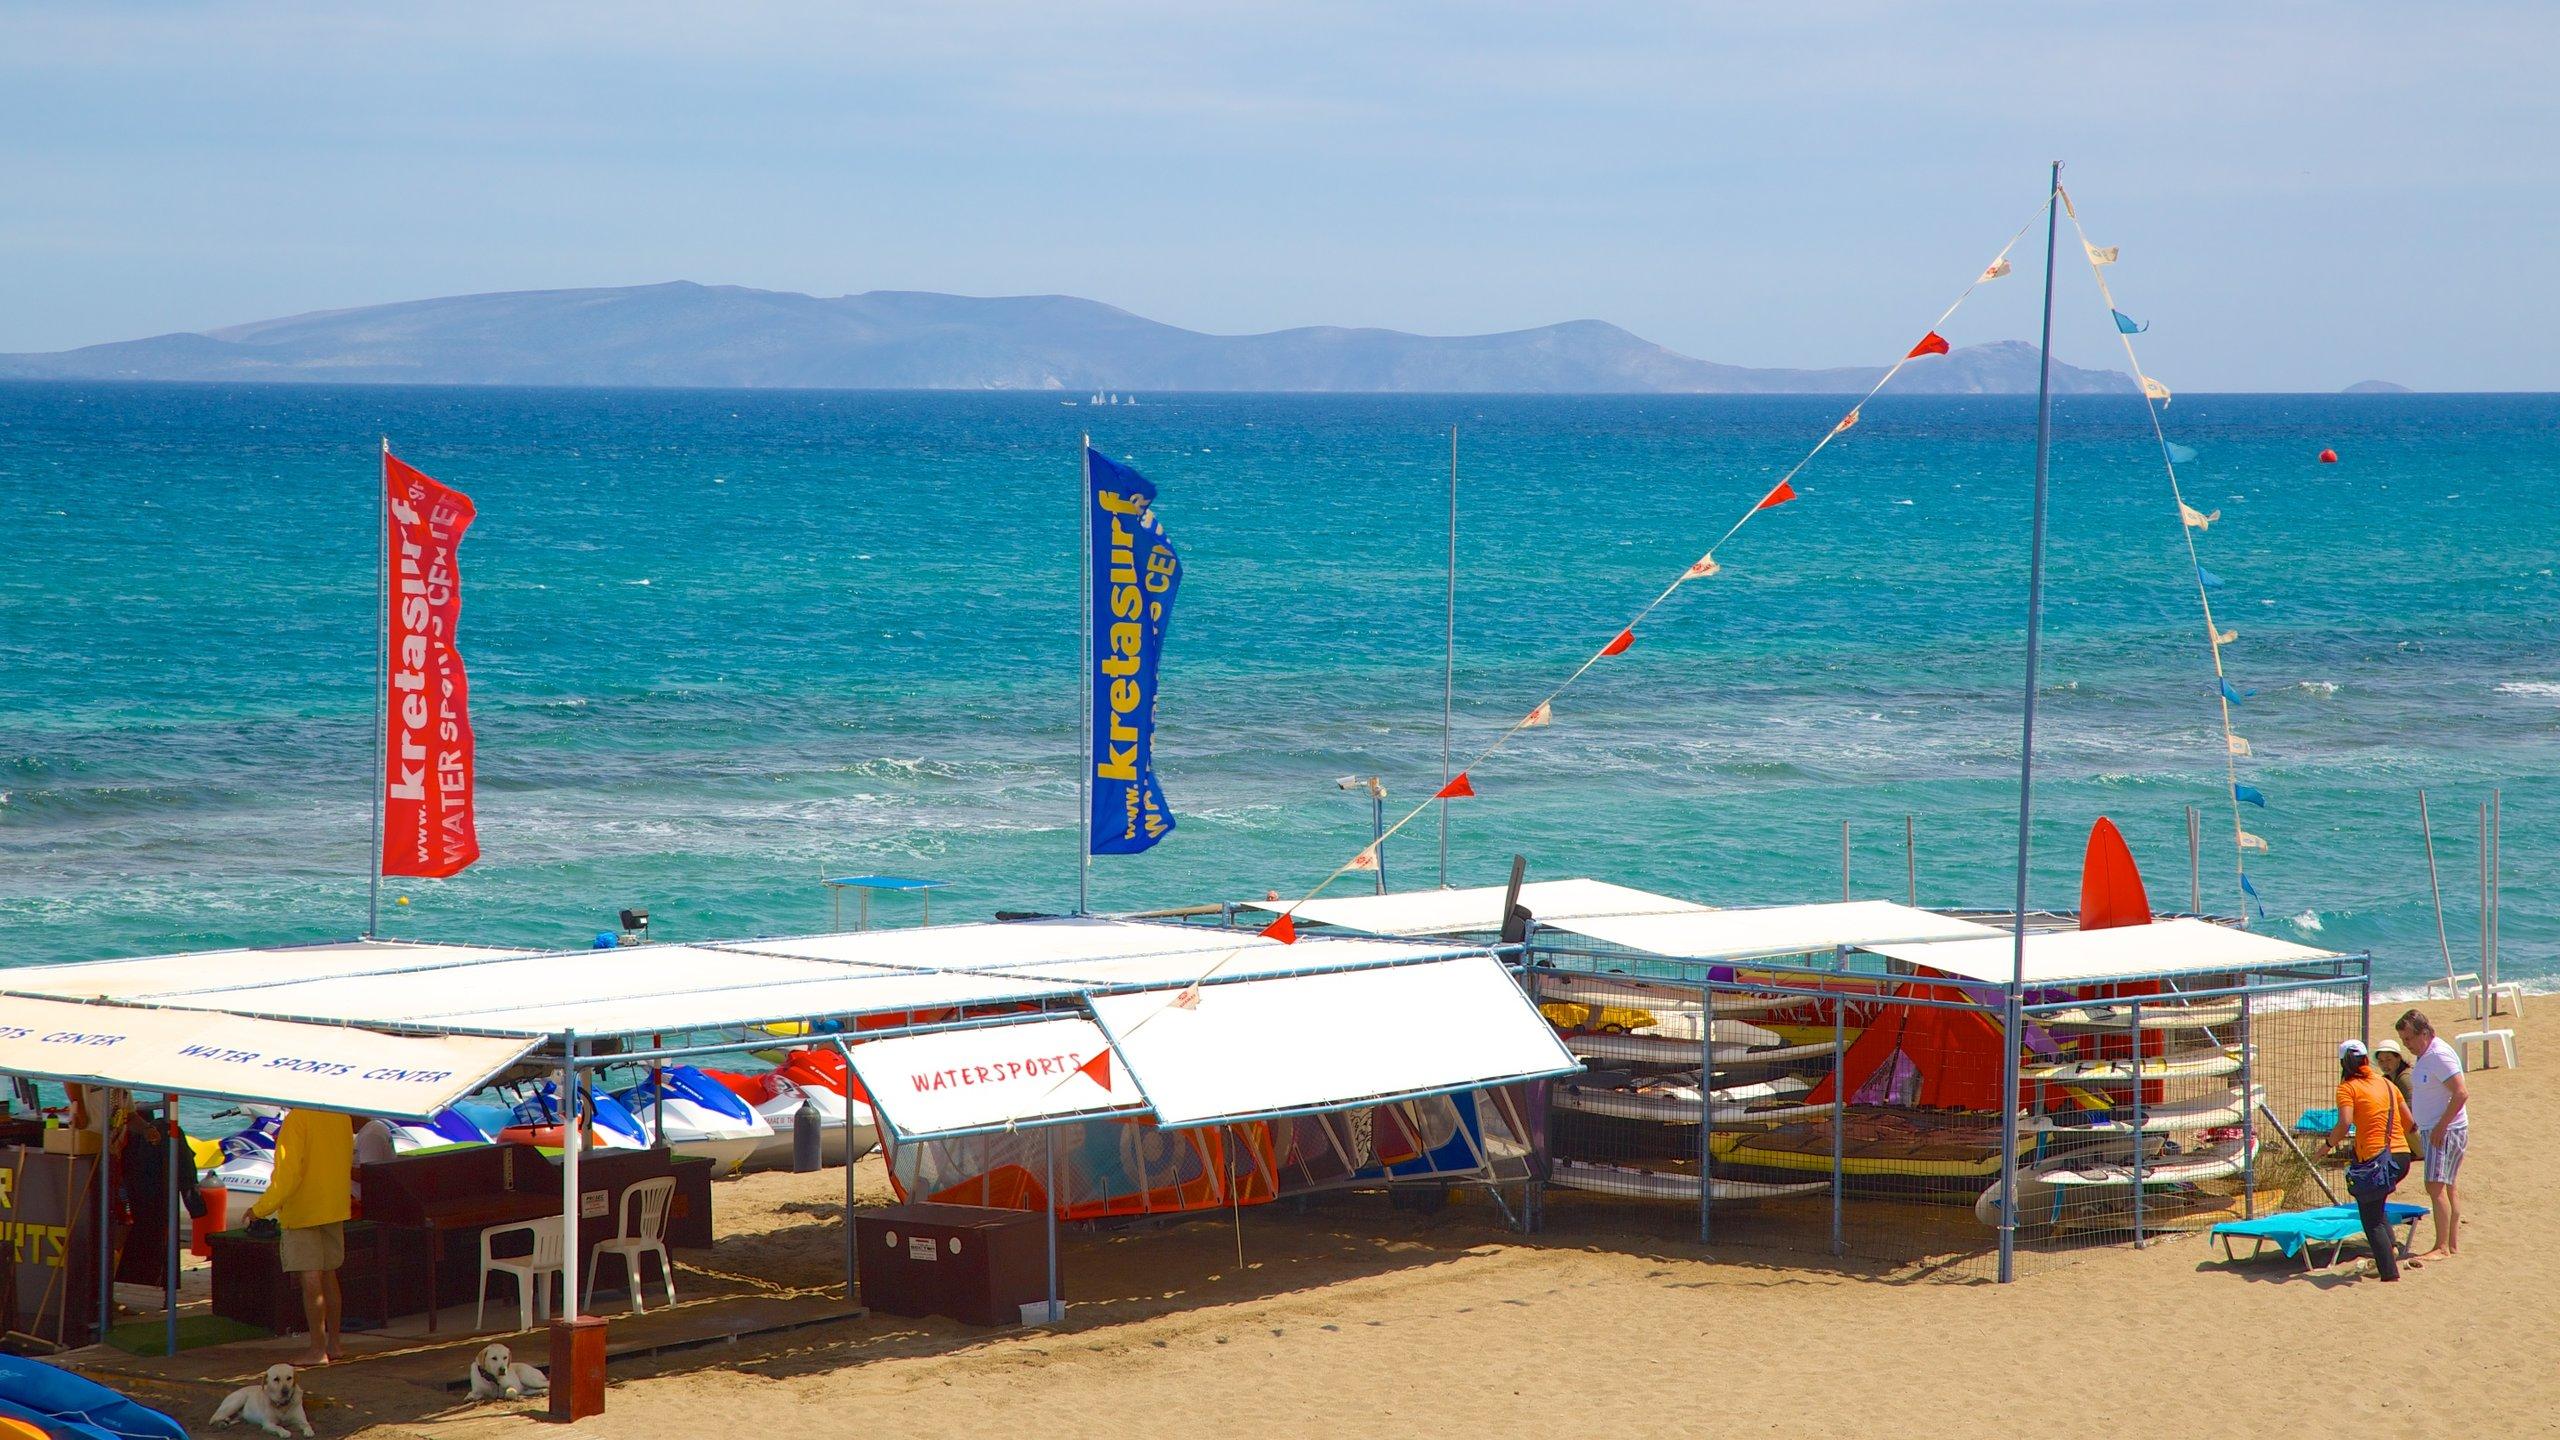 Top 10 Beach Hotels in Heraklion $36: Hotels & Resorts near